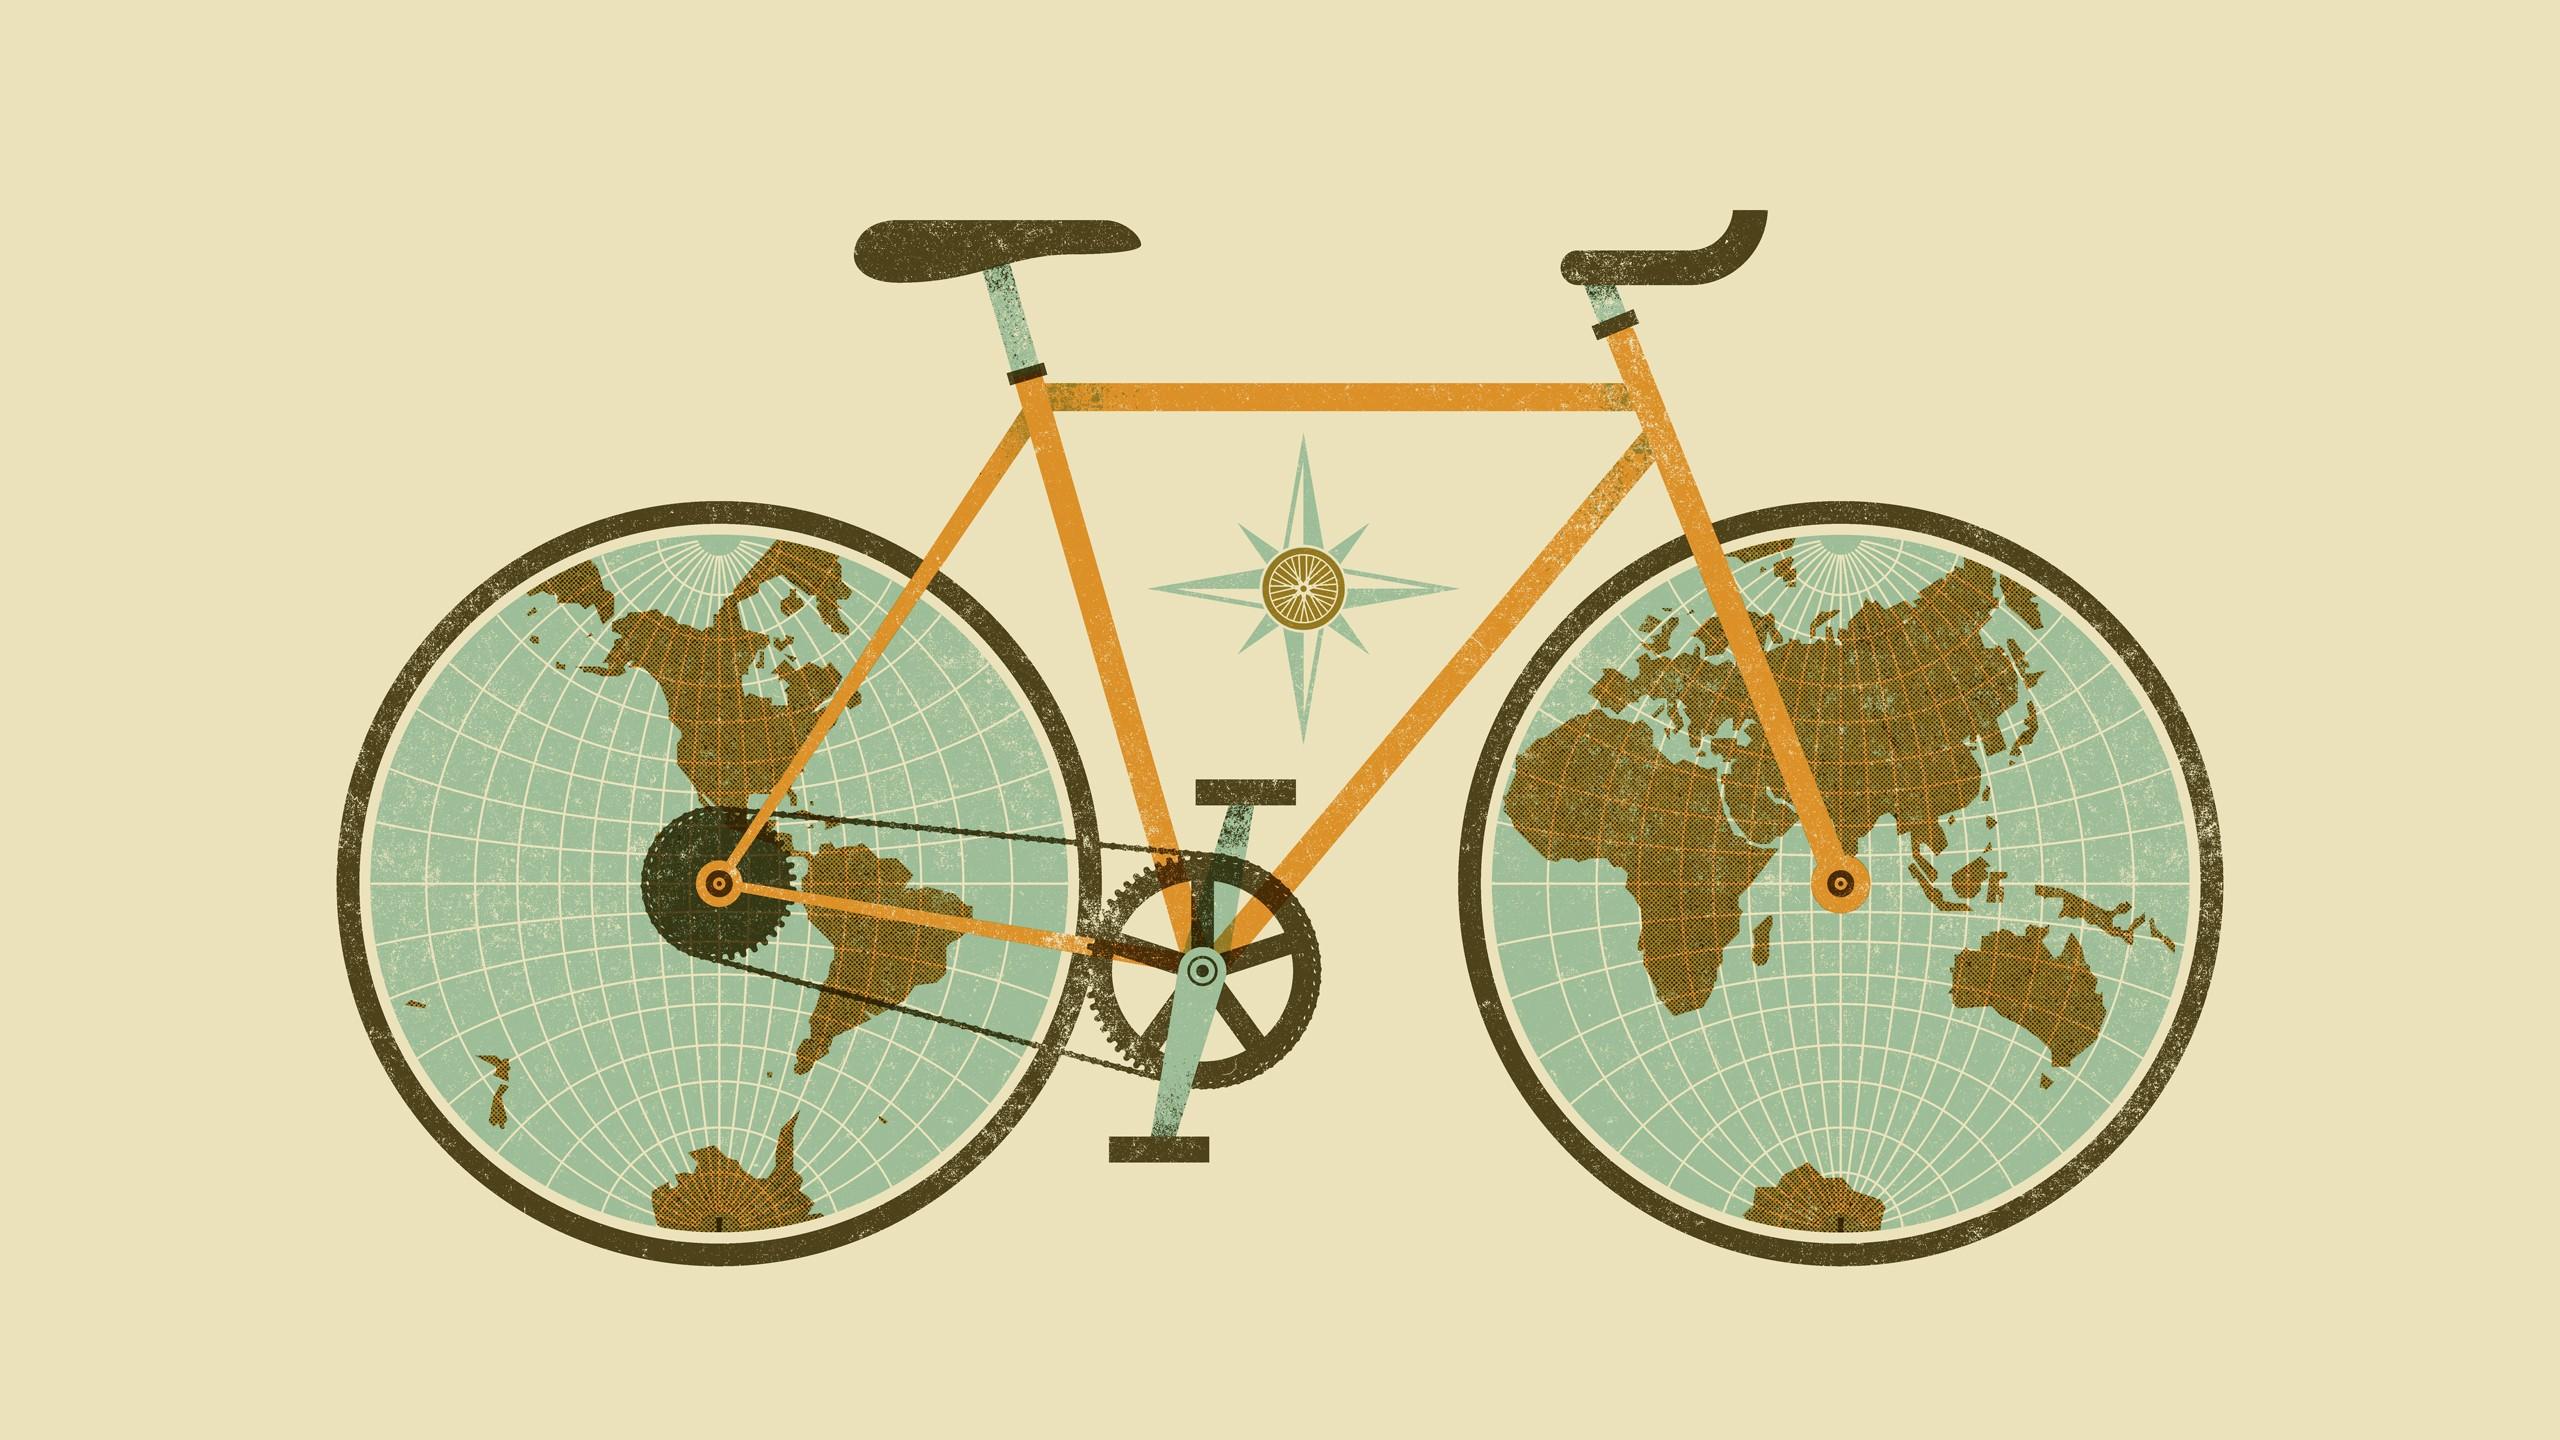 Wallpaper 2560x1440 px africa antarctica asia australia 2560x1440 px africa antarctica asia australia bicycle chains continents digital art earth europe gears map minimalism publicscrutiny Images